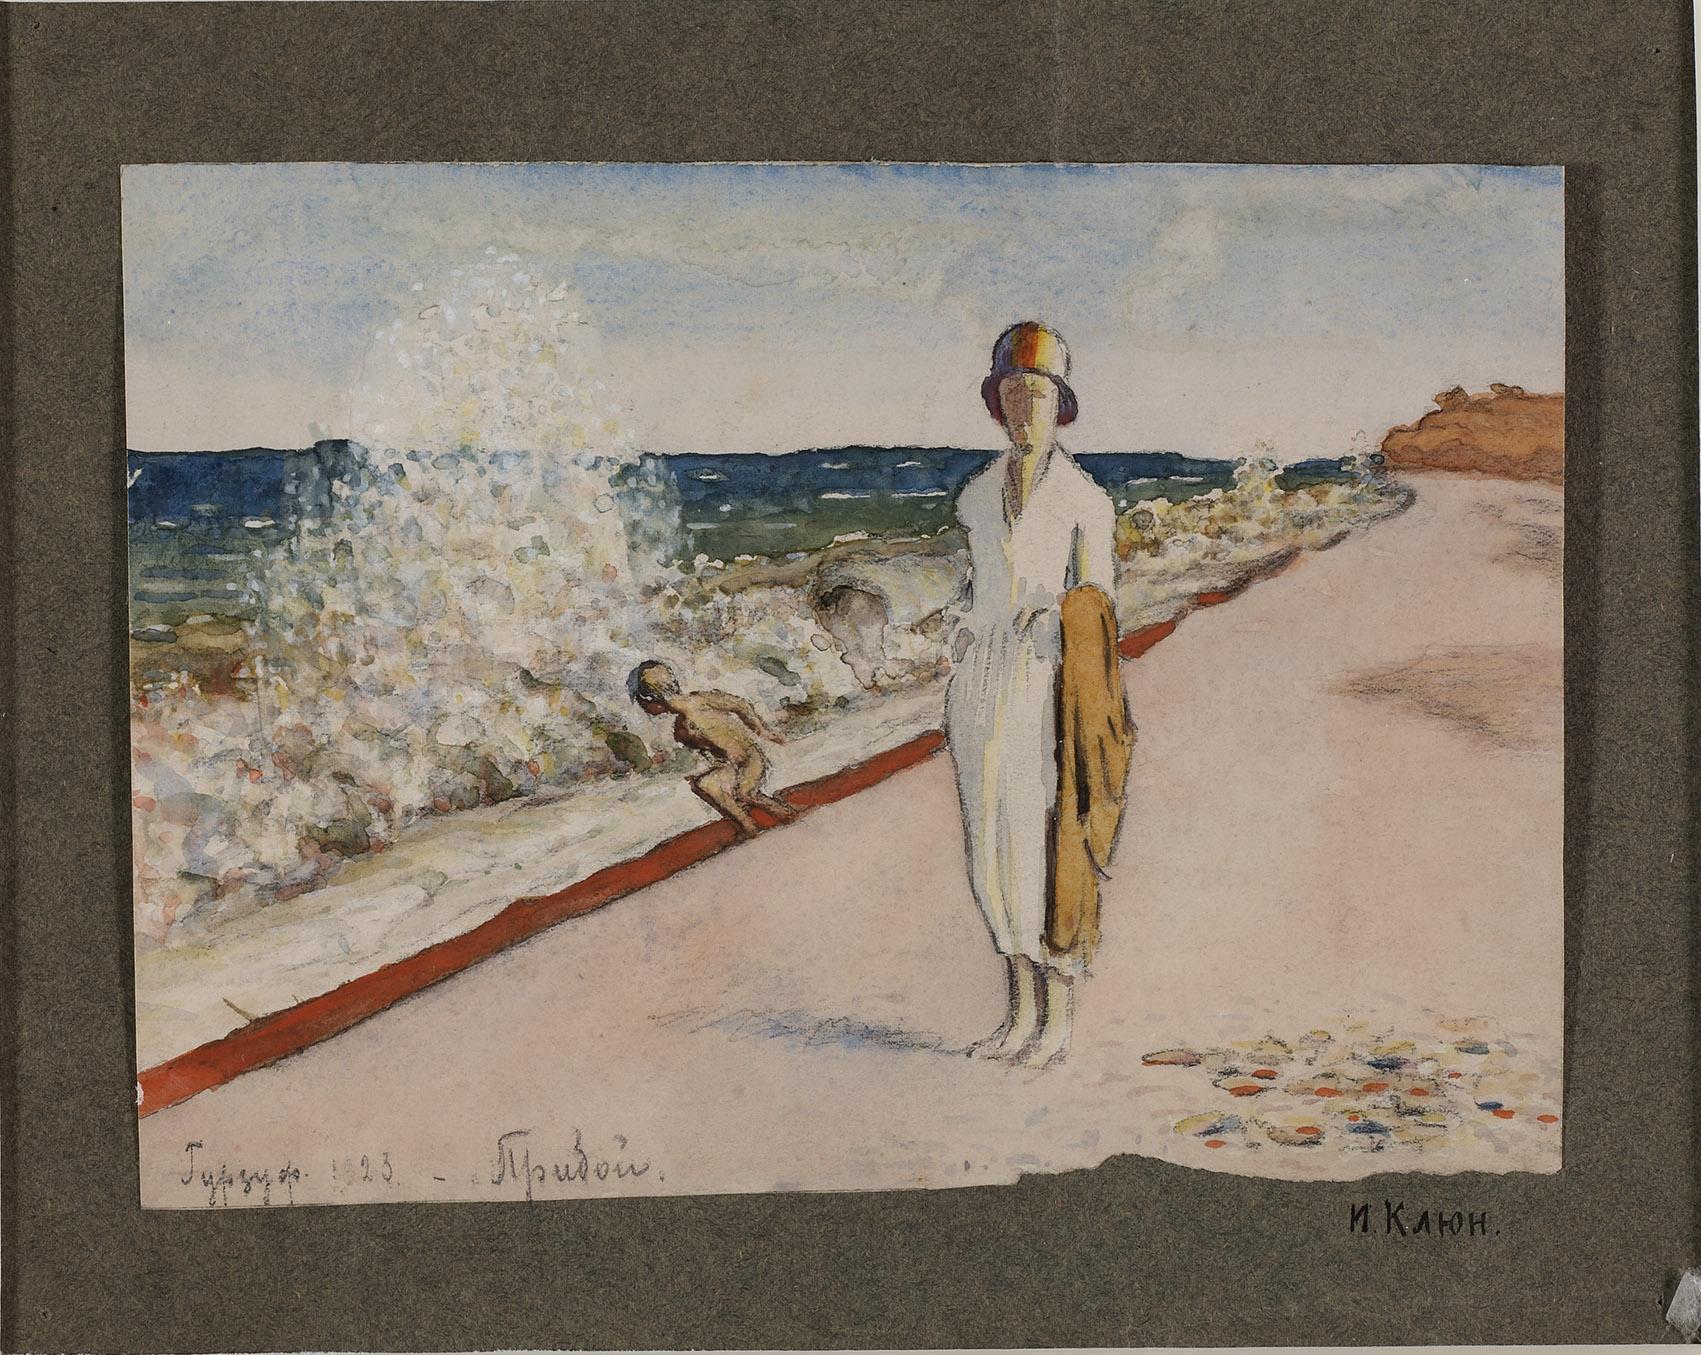 Иван Клюн. «Гурзуф. Прибой», 1923 / Из коллекции Георгия Костаки / MOMus